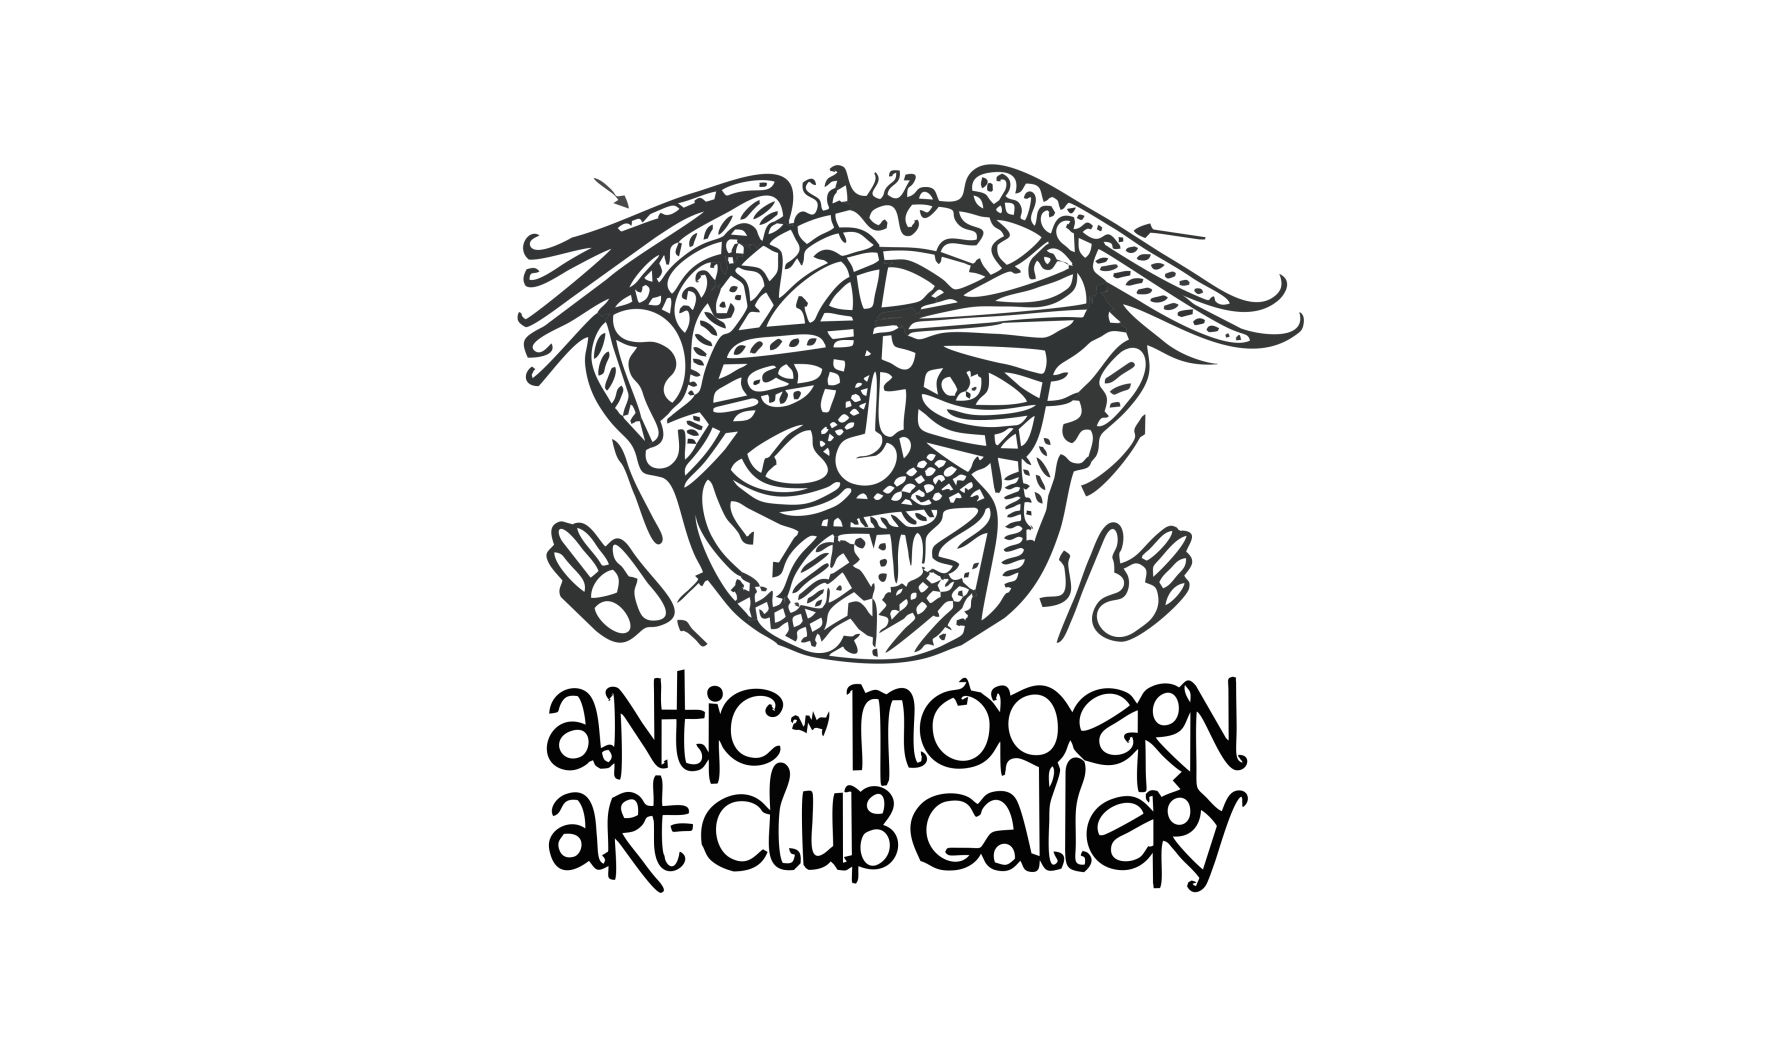 ANTIQOE MODERN ART CLUB GALLERY